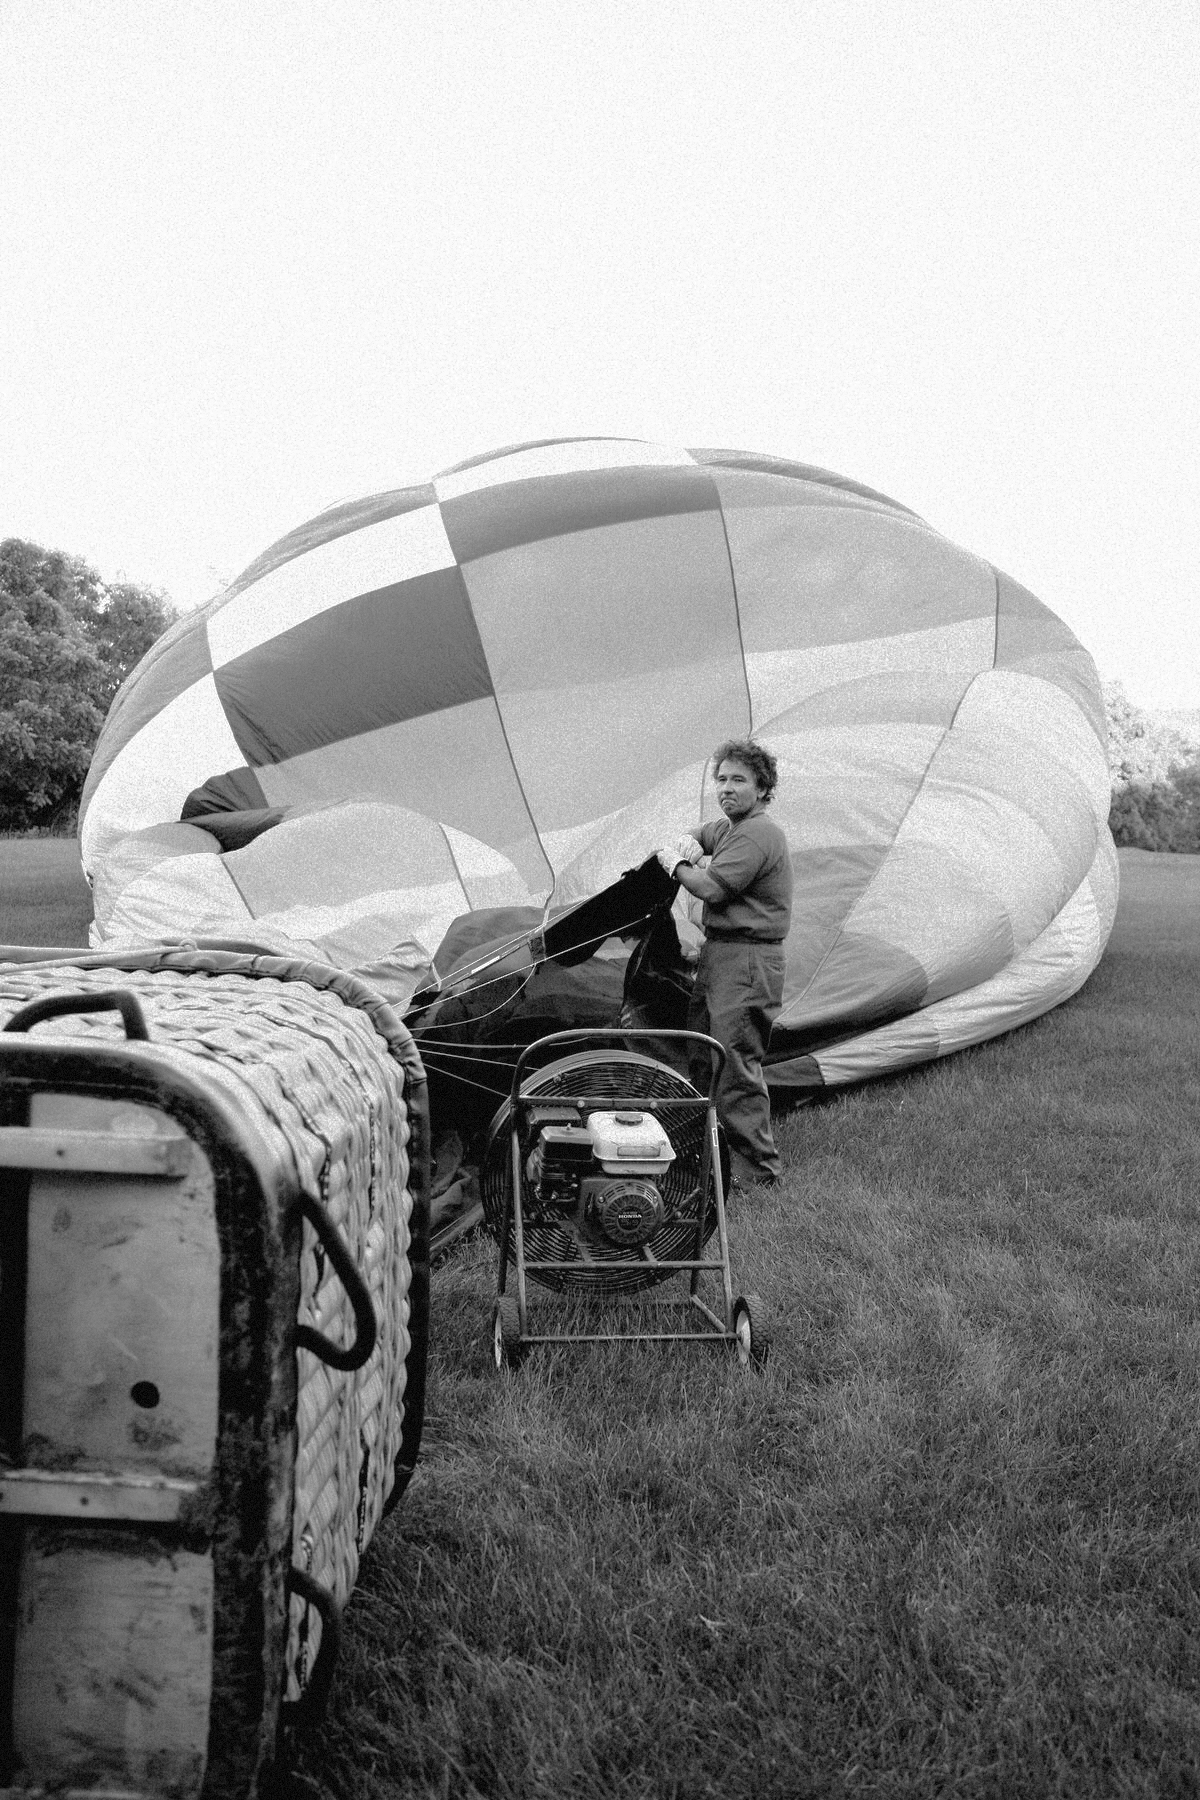 Hot-Air-Balloon-Ride-Galena-Illinois-fine-art-photography-by-Studio-L-photographer-Laura-Schneider-_6119